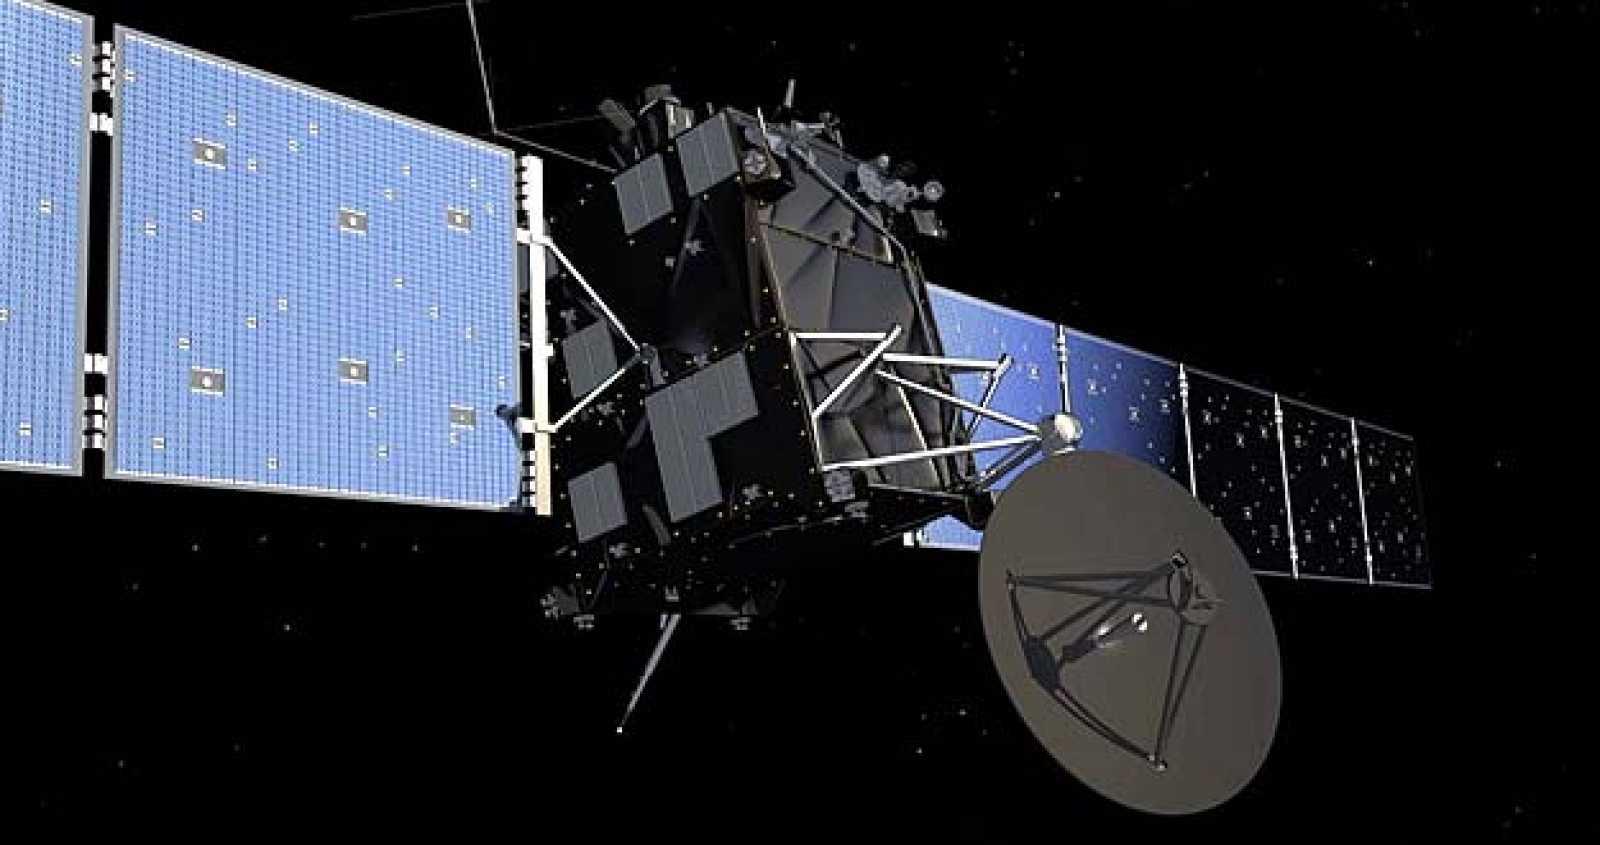 La sonda Rosetta, a punto de despertarse